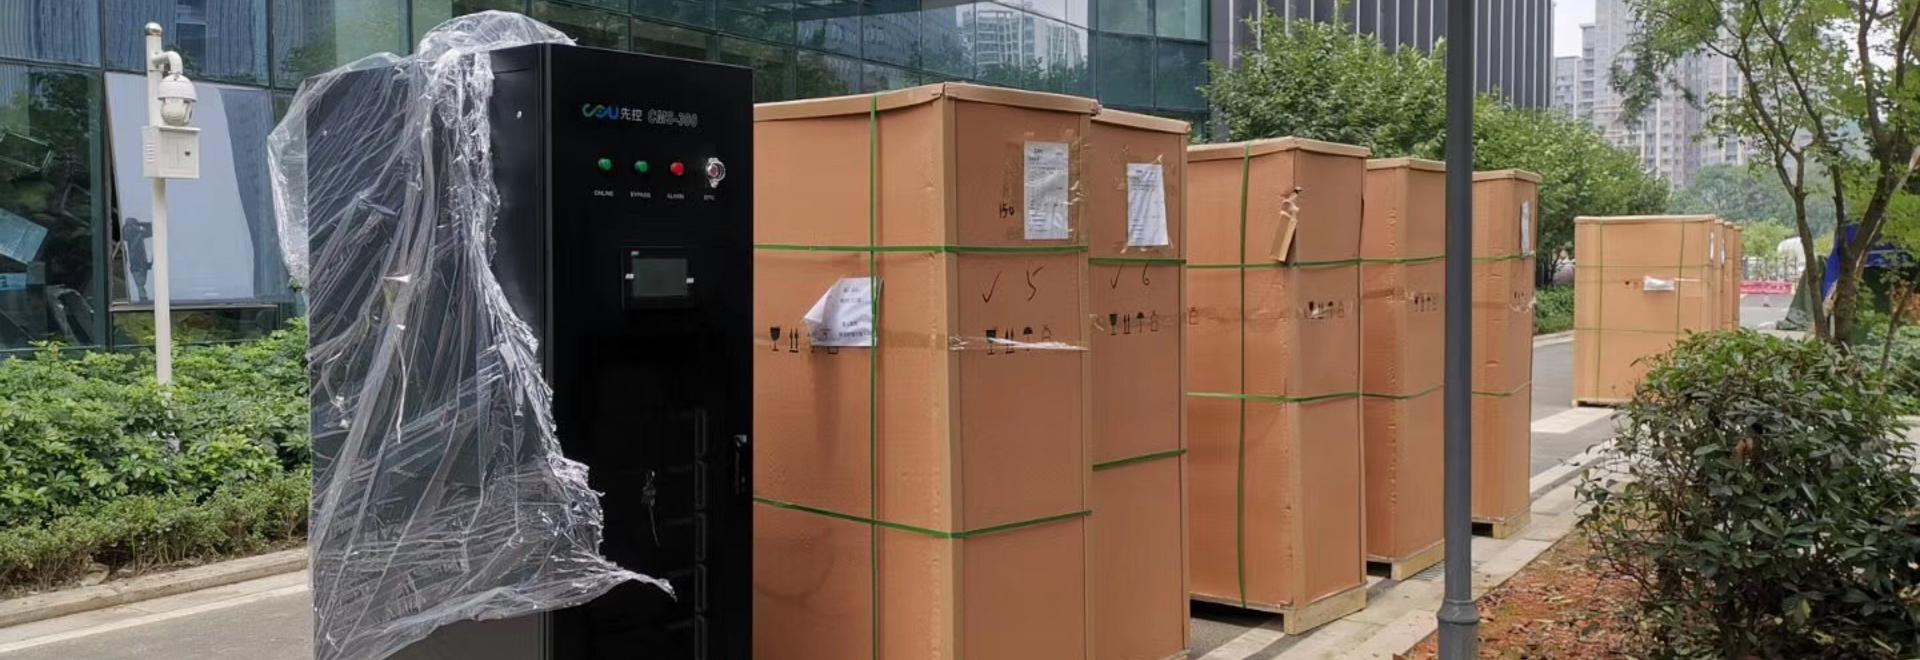 Sicon CMS-300 Modulare USV 300kW